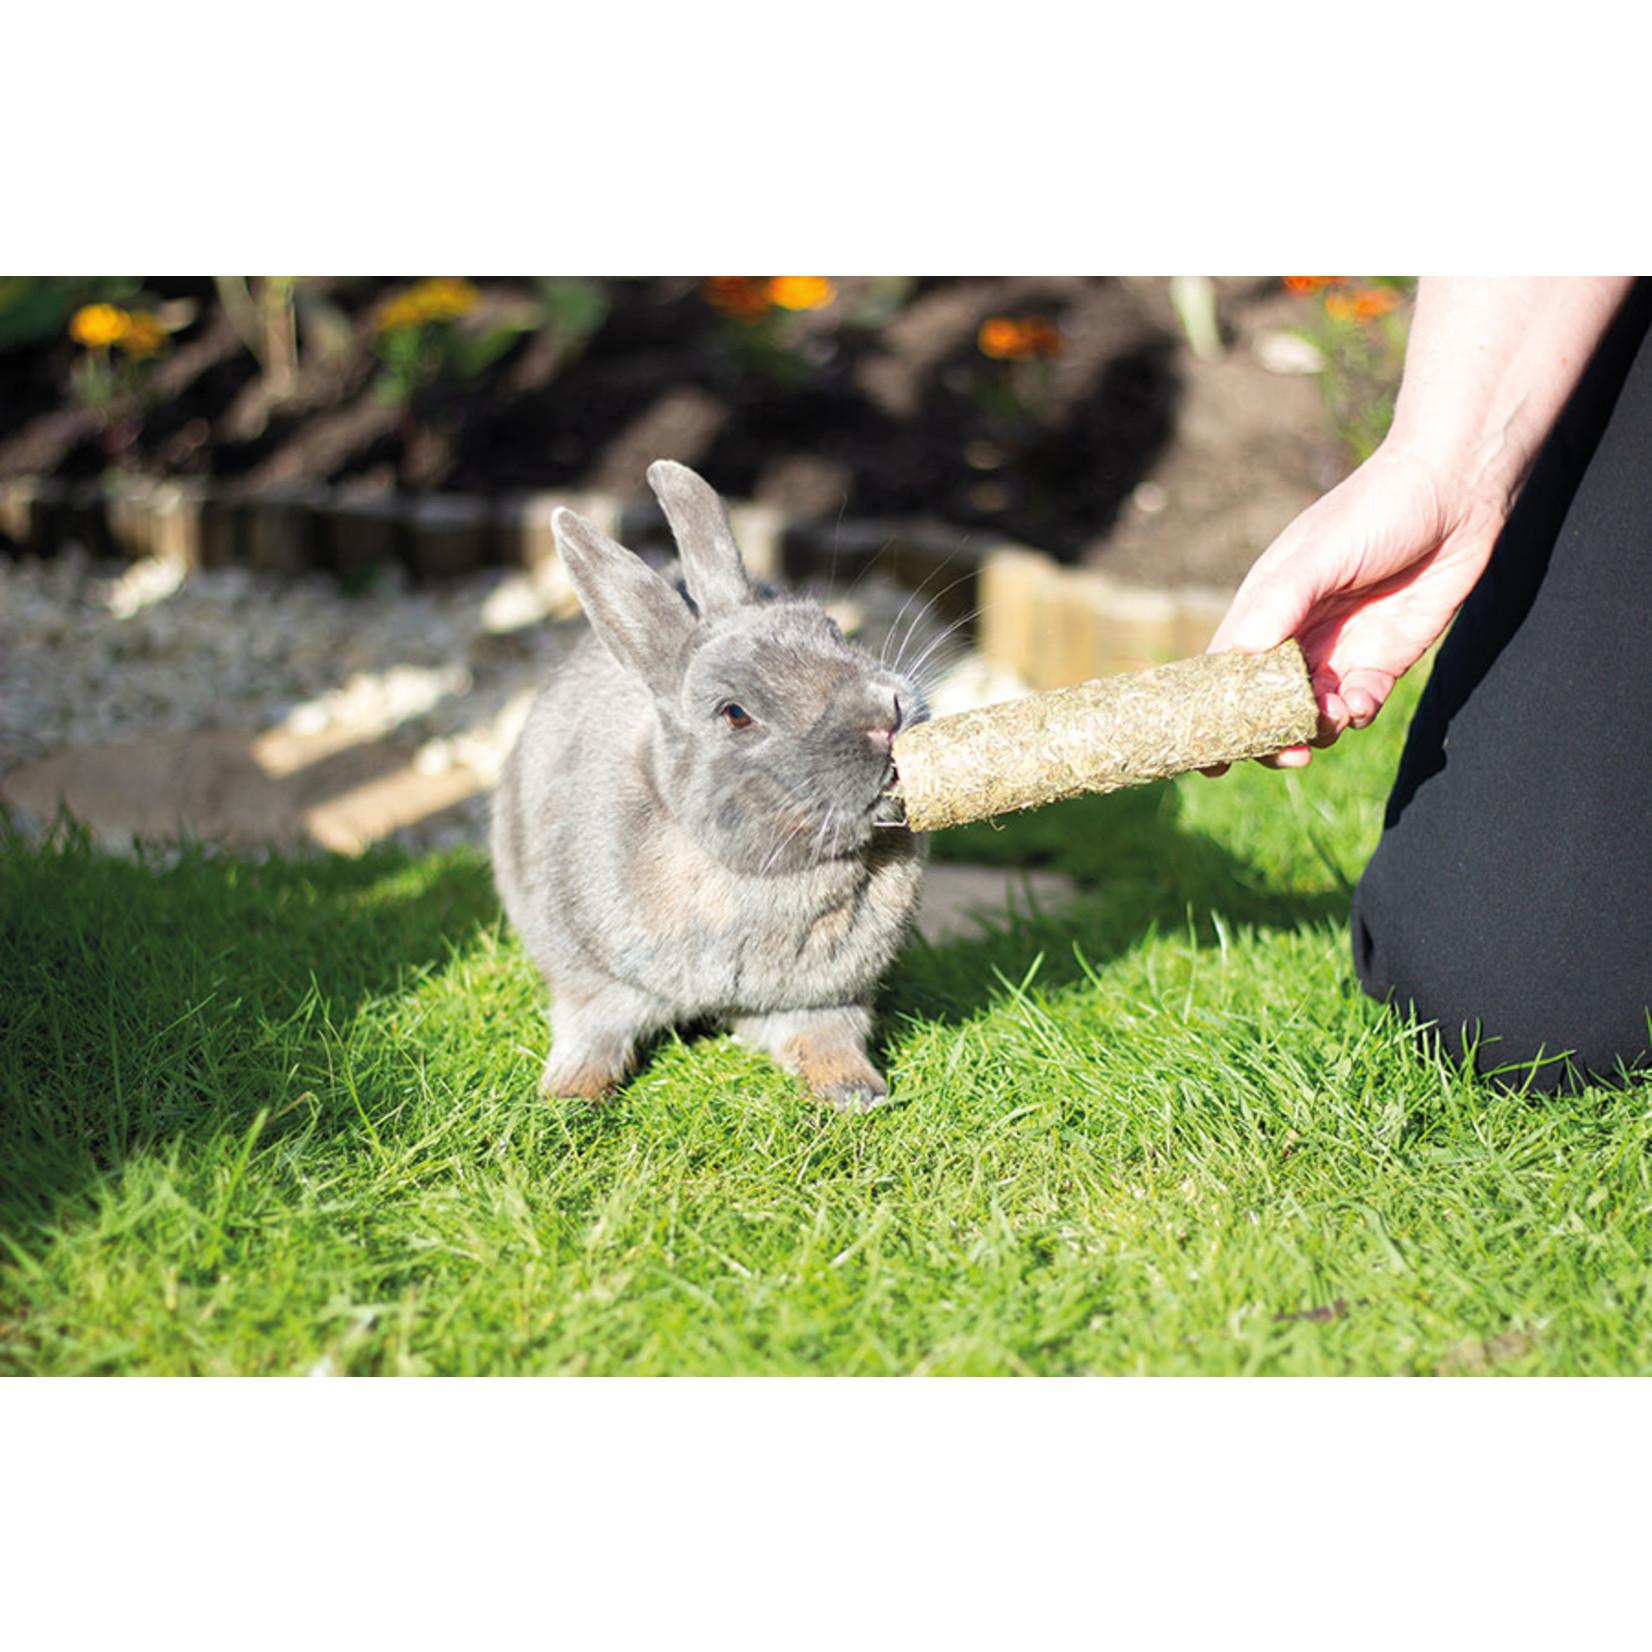 Rosewood Boredom Breaker Naturals Pea 'n' Mint Rollers Small Animal Treat, 2 pack